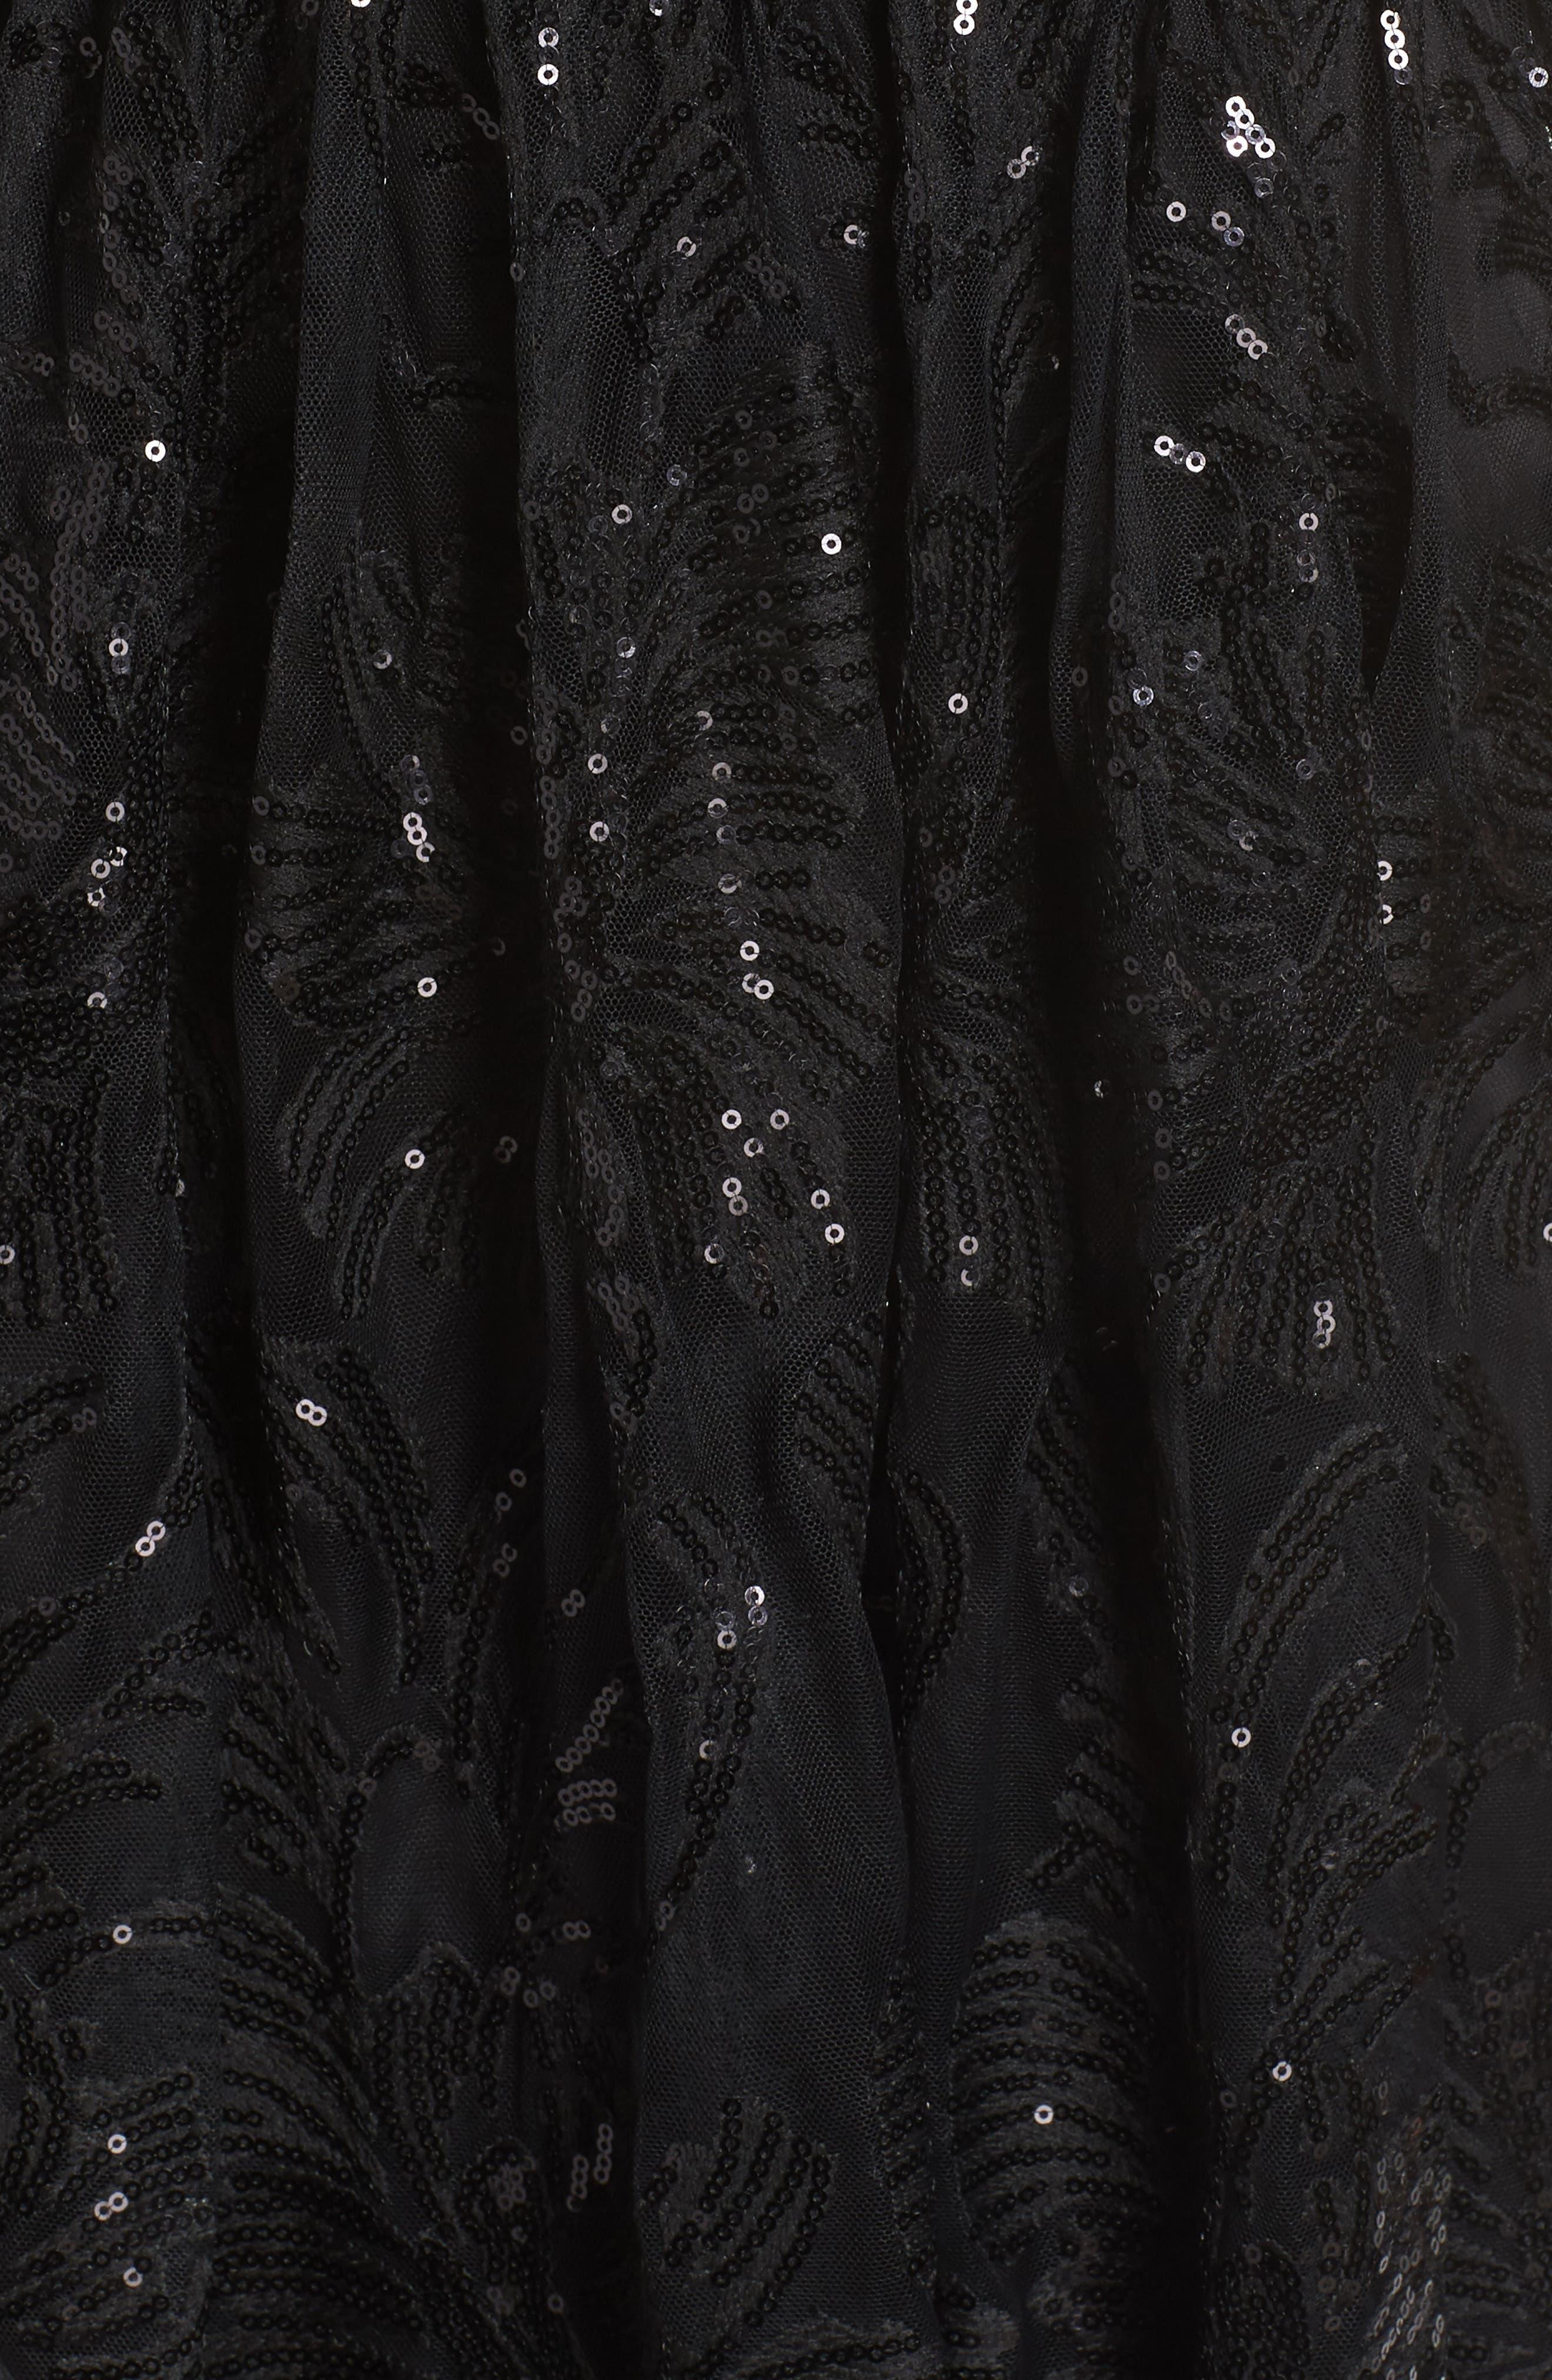 ELIZA J, Sequin Embroidered Mesh Evening Dress, Alternate thumbnail 6, color, BLACK